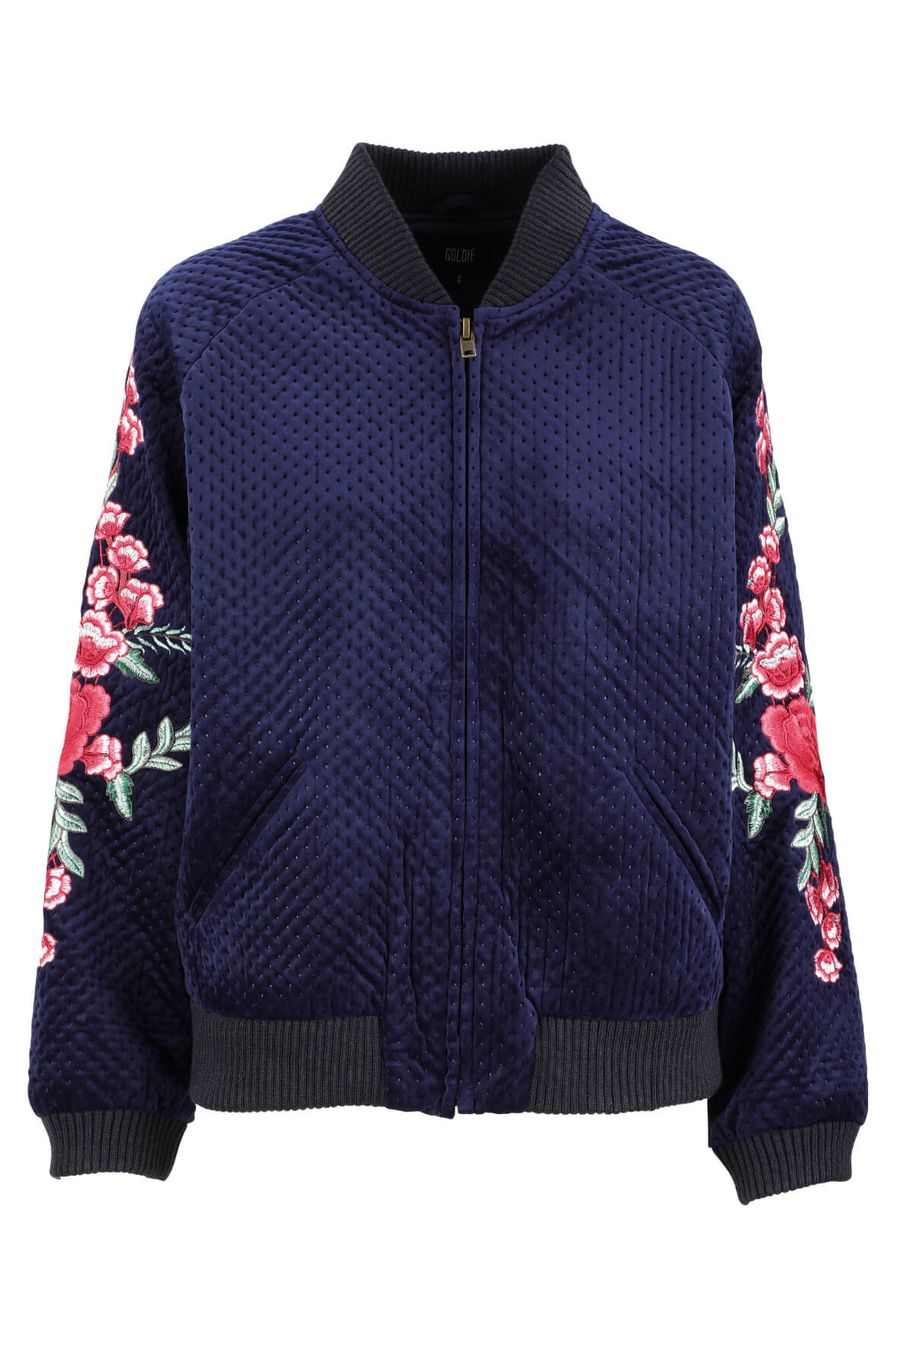 goldie-navy-quilted-velvet-bomber-jacket-1